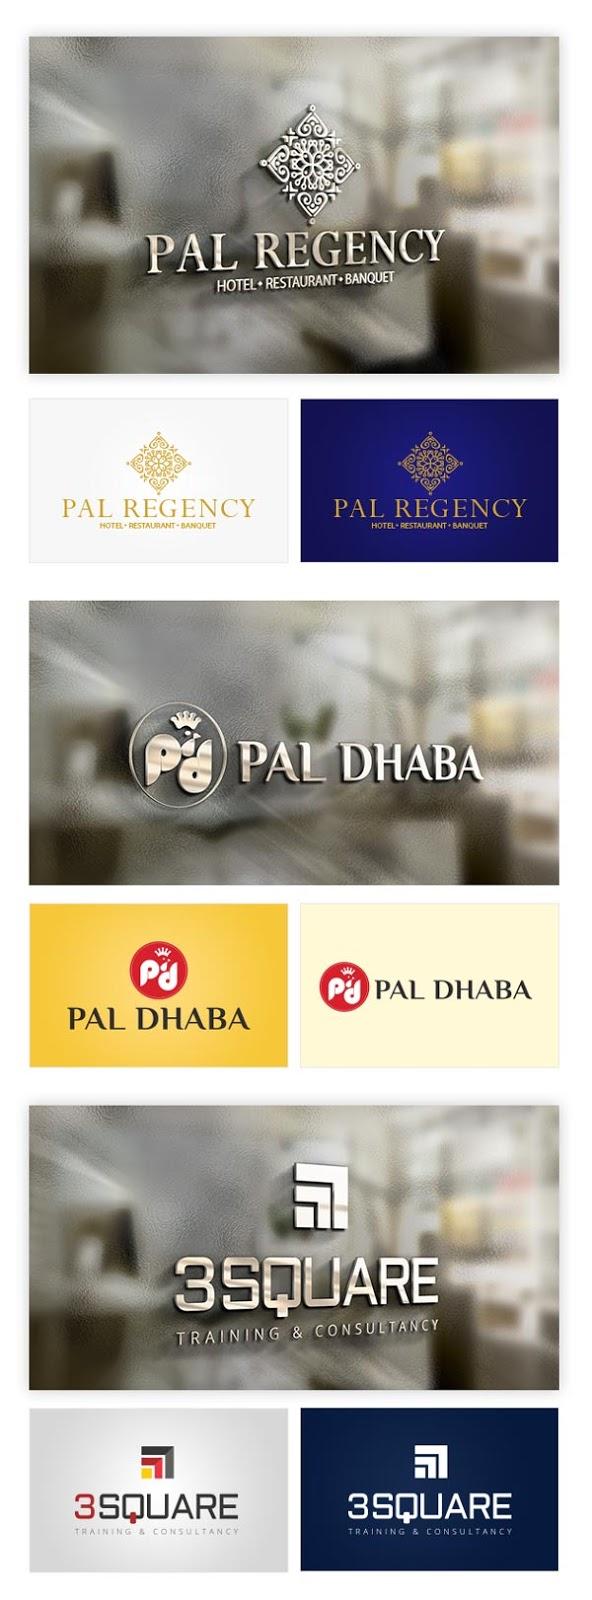 Logo Designing Chandigarh